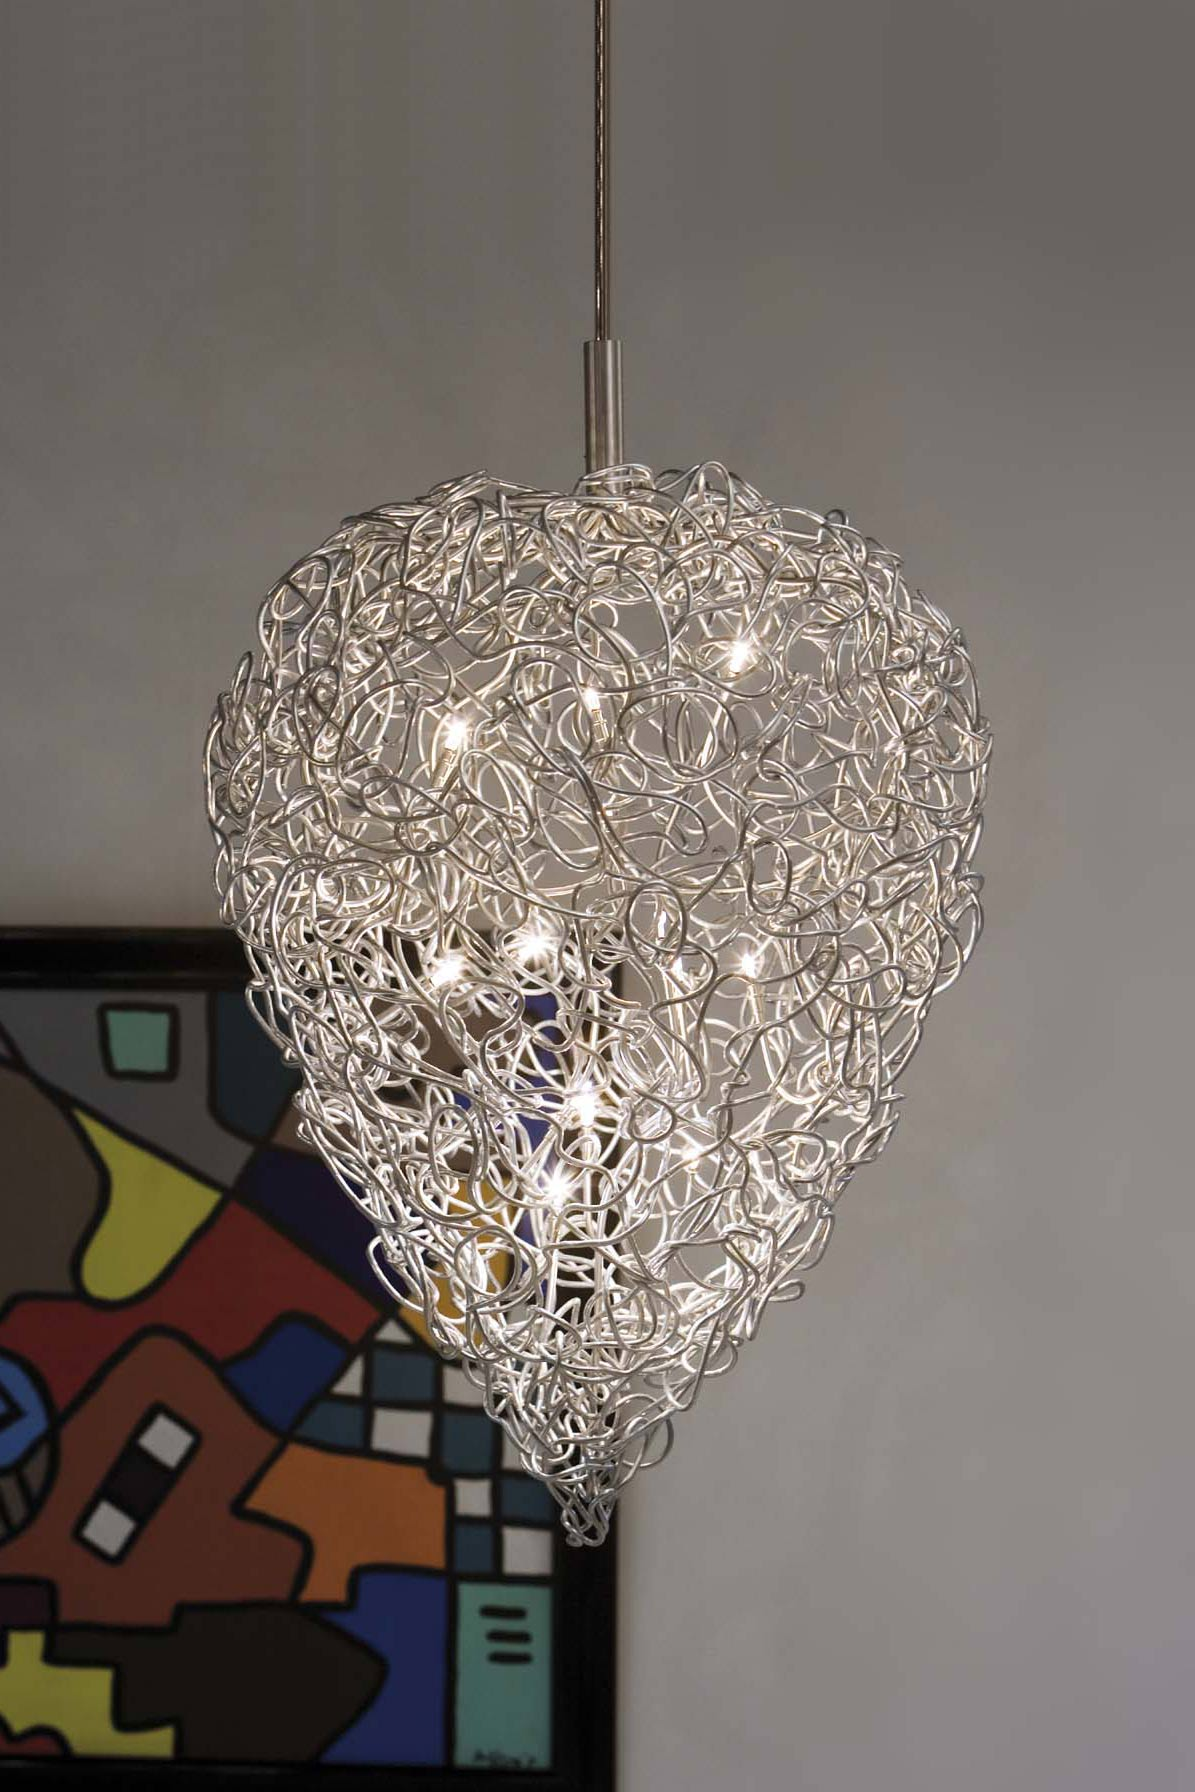 carrot suspension design en fil de m tal harco loor luminaires en verre et cristal r f. Black Bedroom Furniture Sets. Home Design Ideas